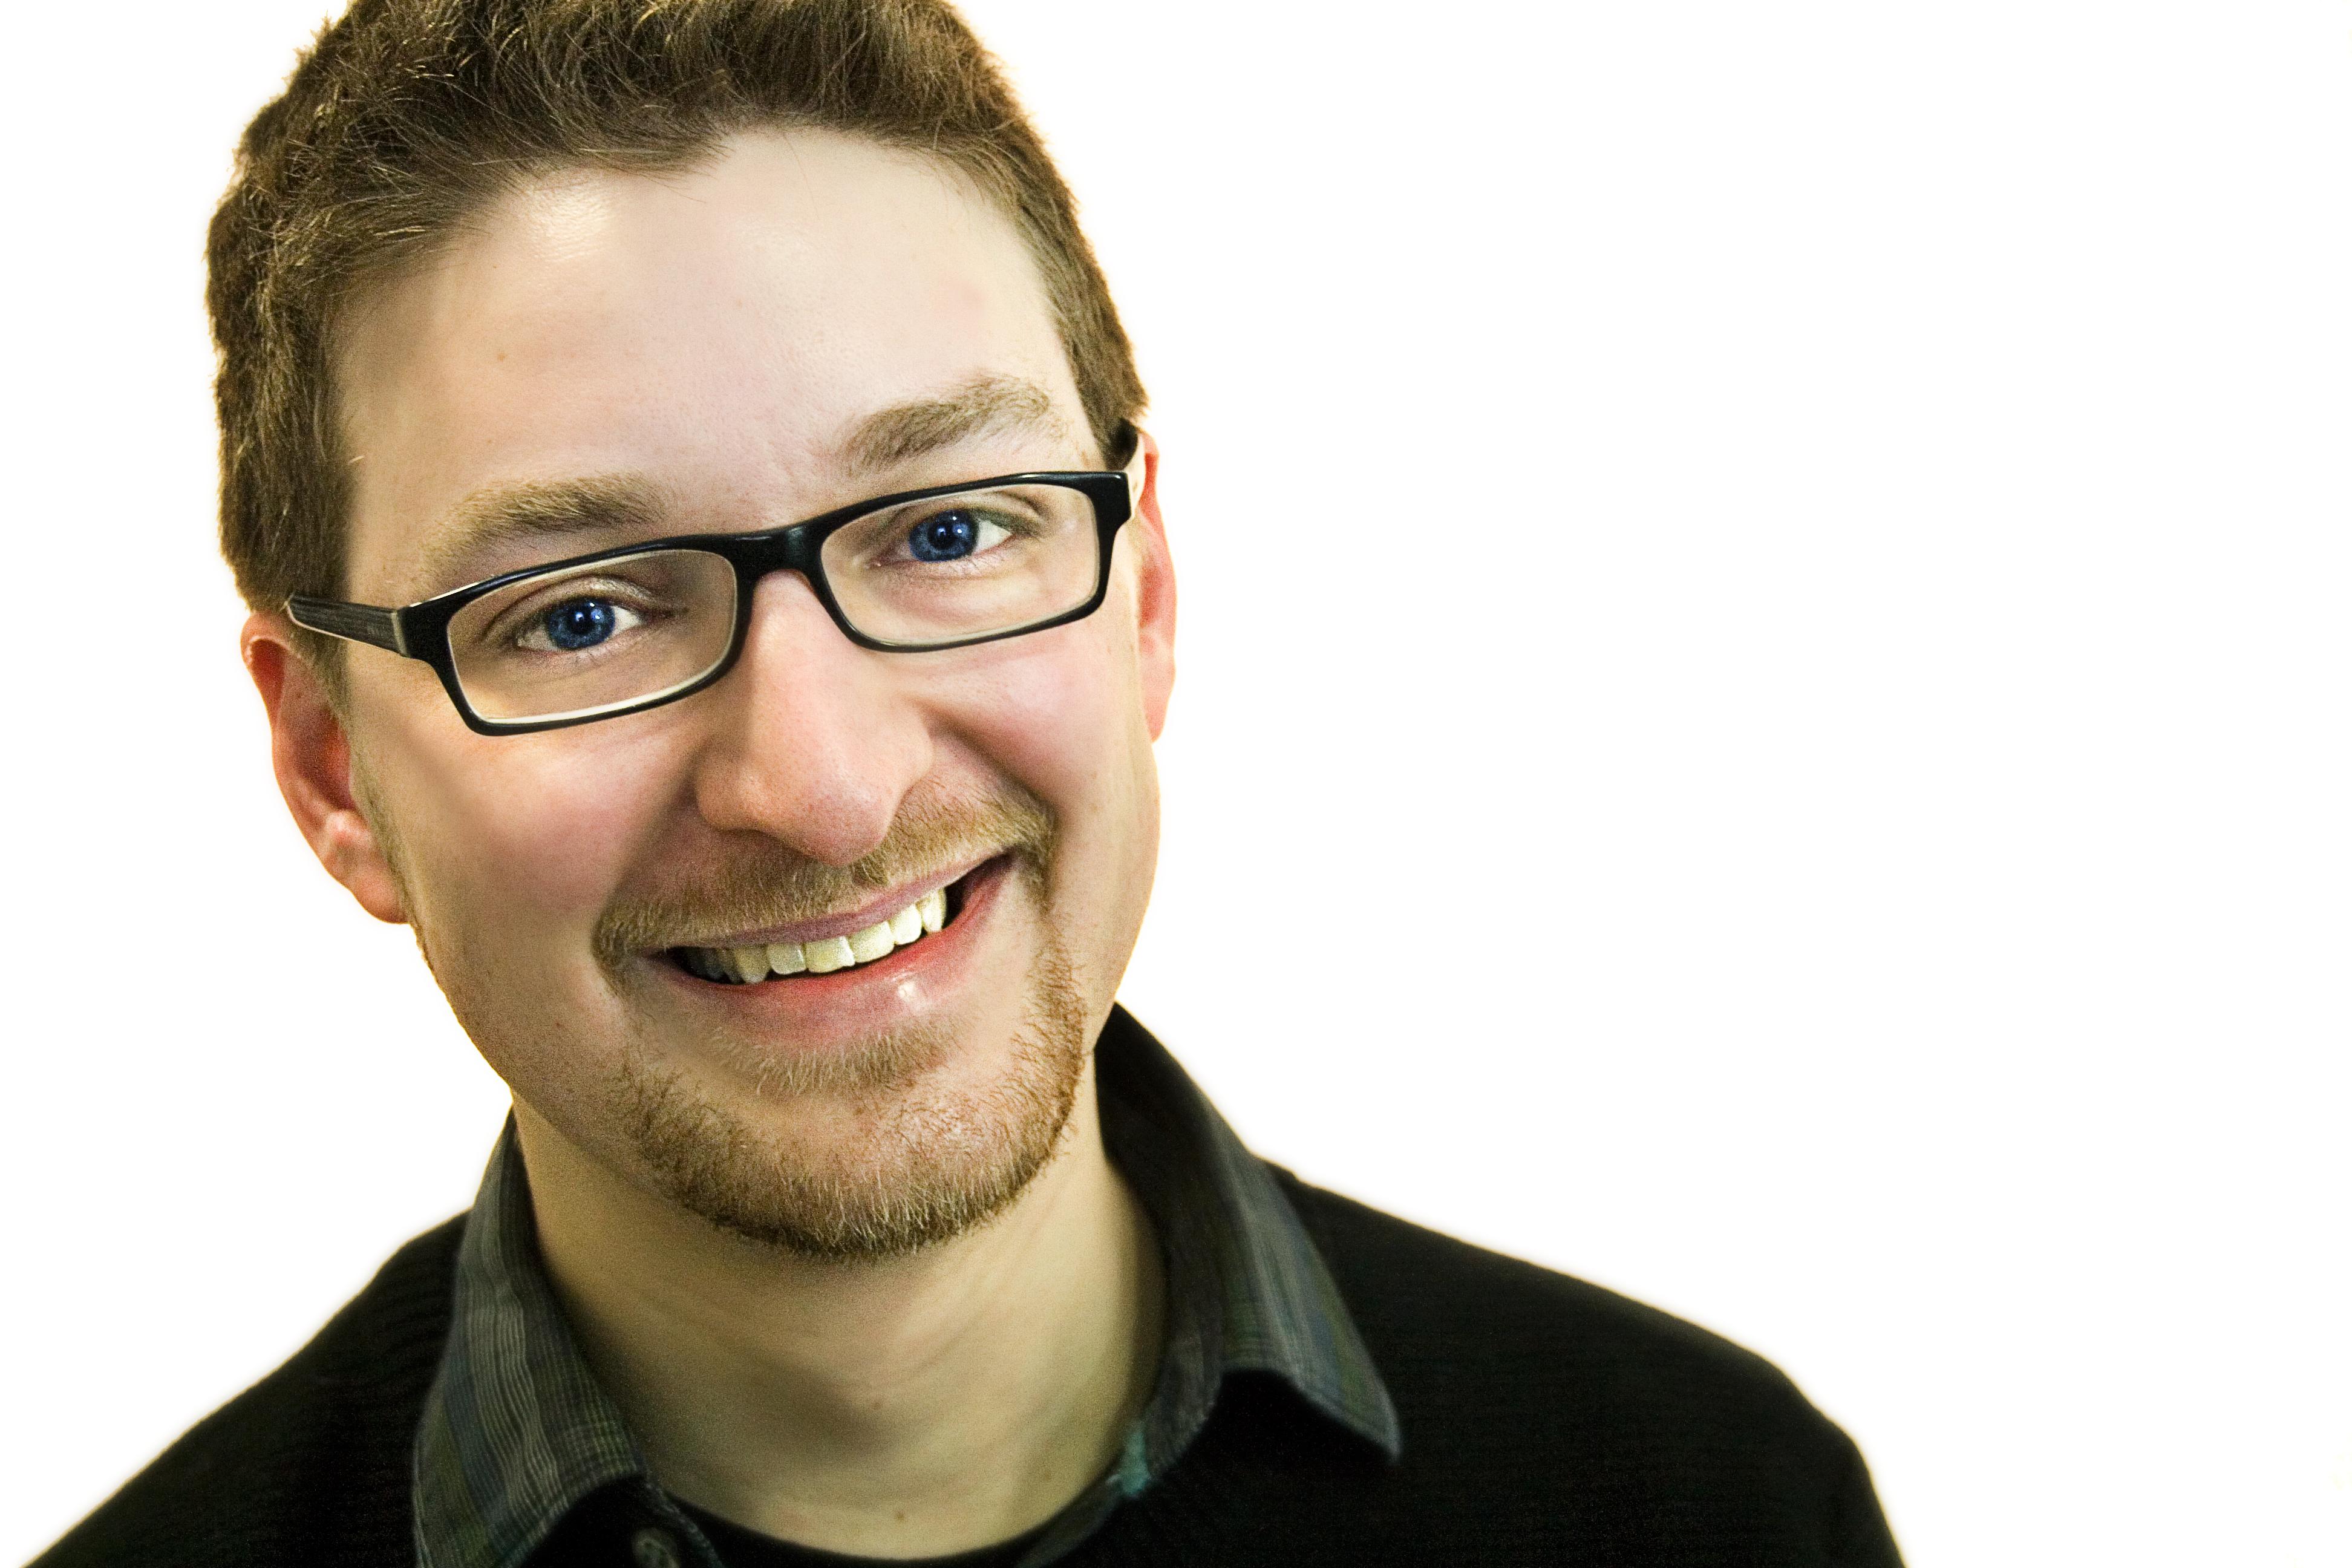 Evan Morgenstern on The Atlantic Transmission Network